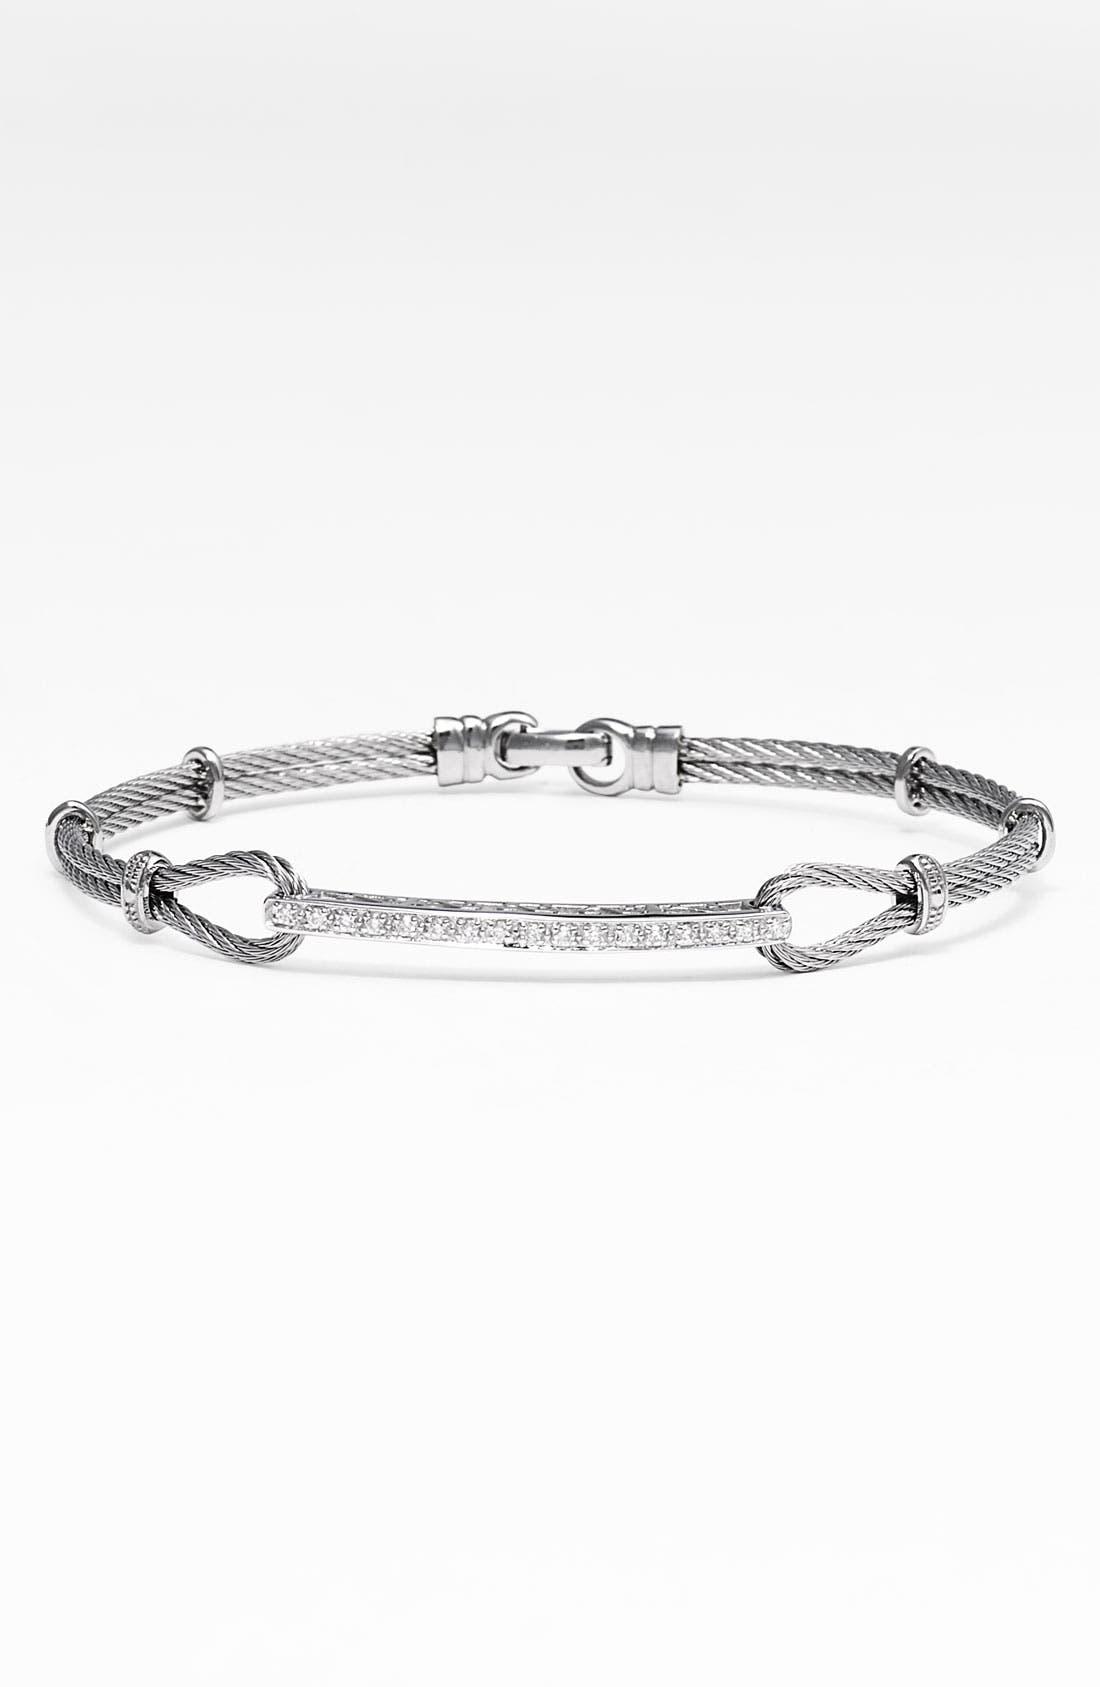 Main Image - ALOR® Diamond ID Bracelet